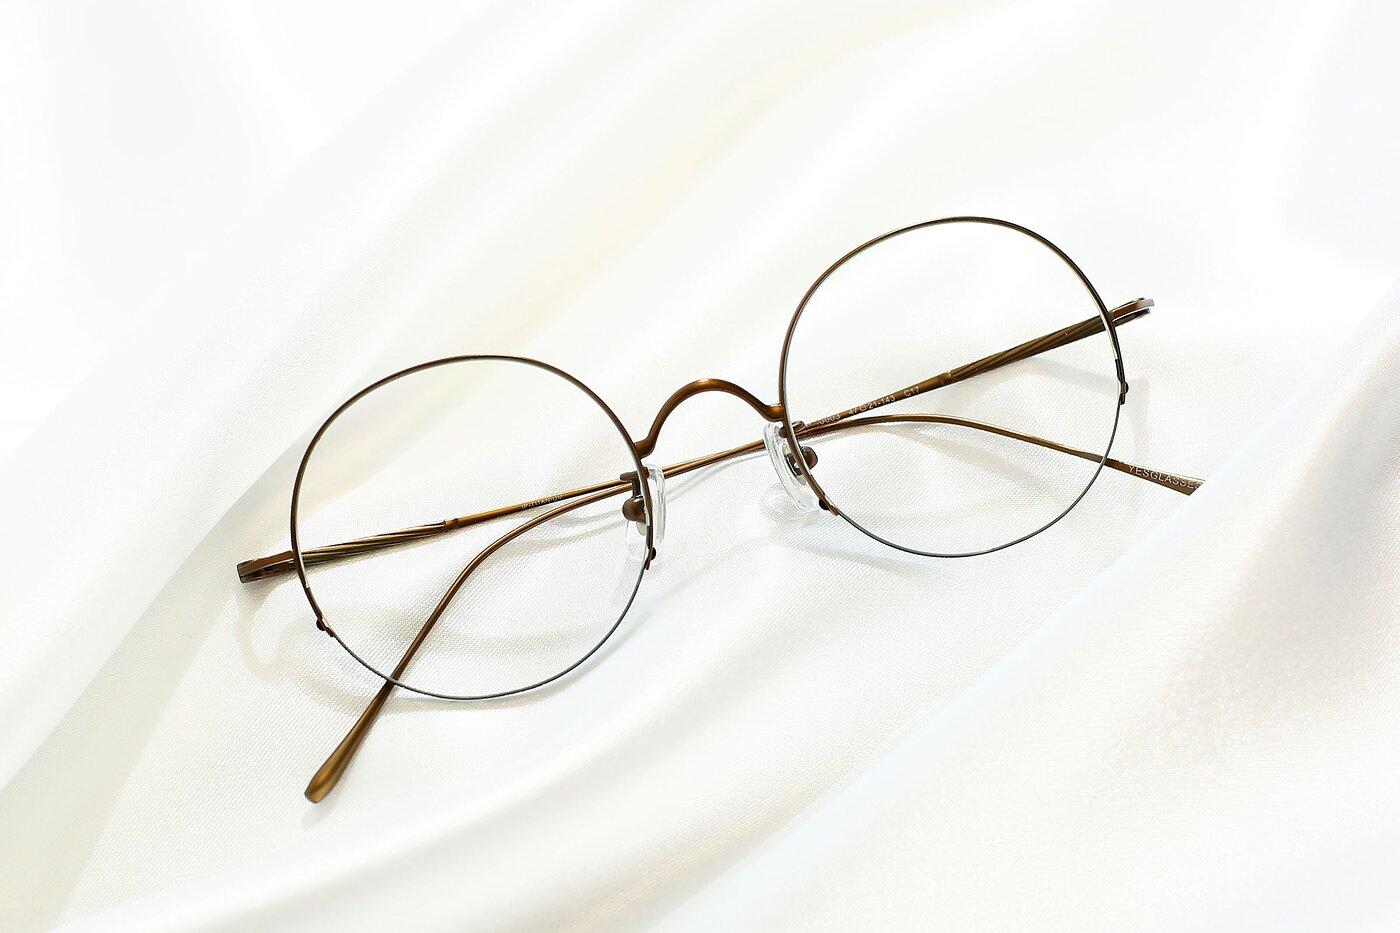 Bronze Retro-Vintage Round Semi-Rimless Eyeglasses